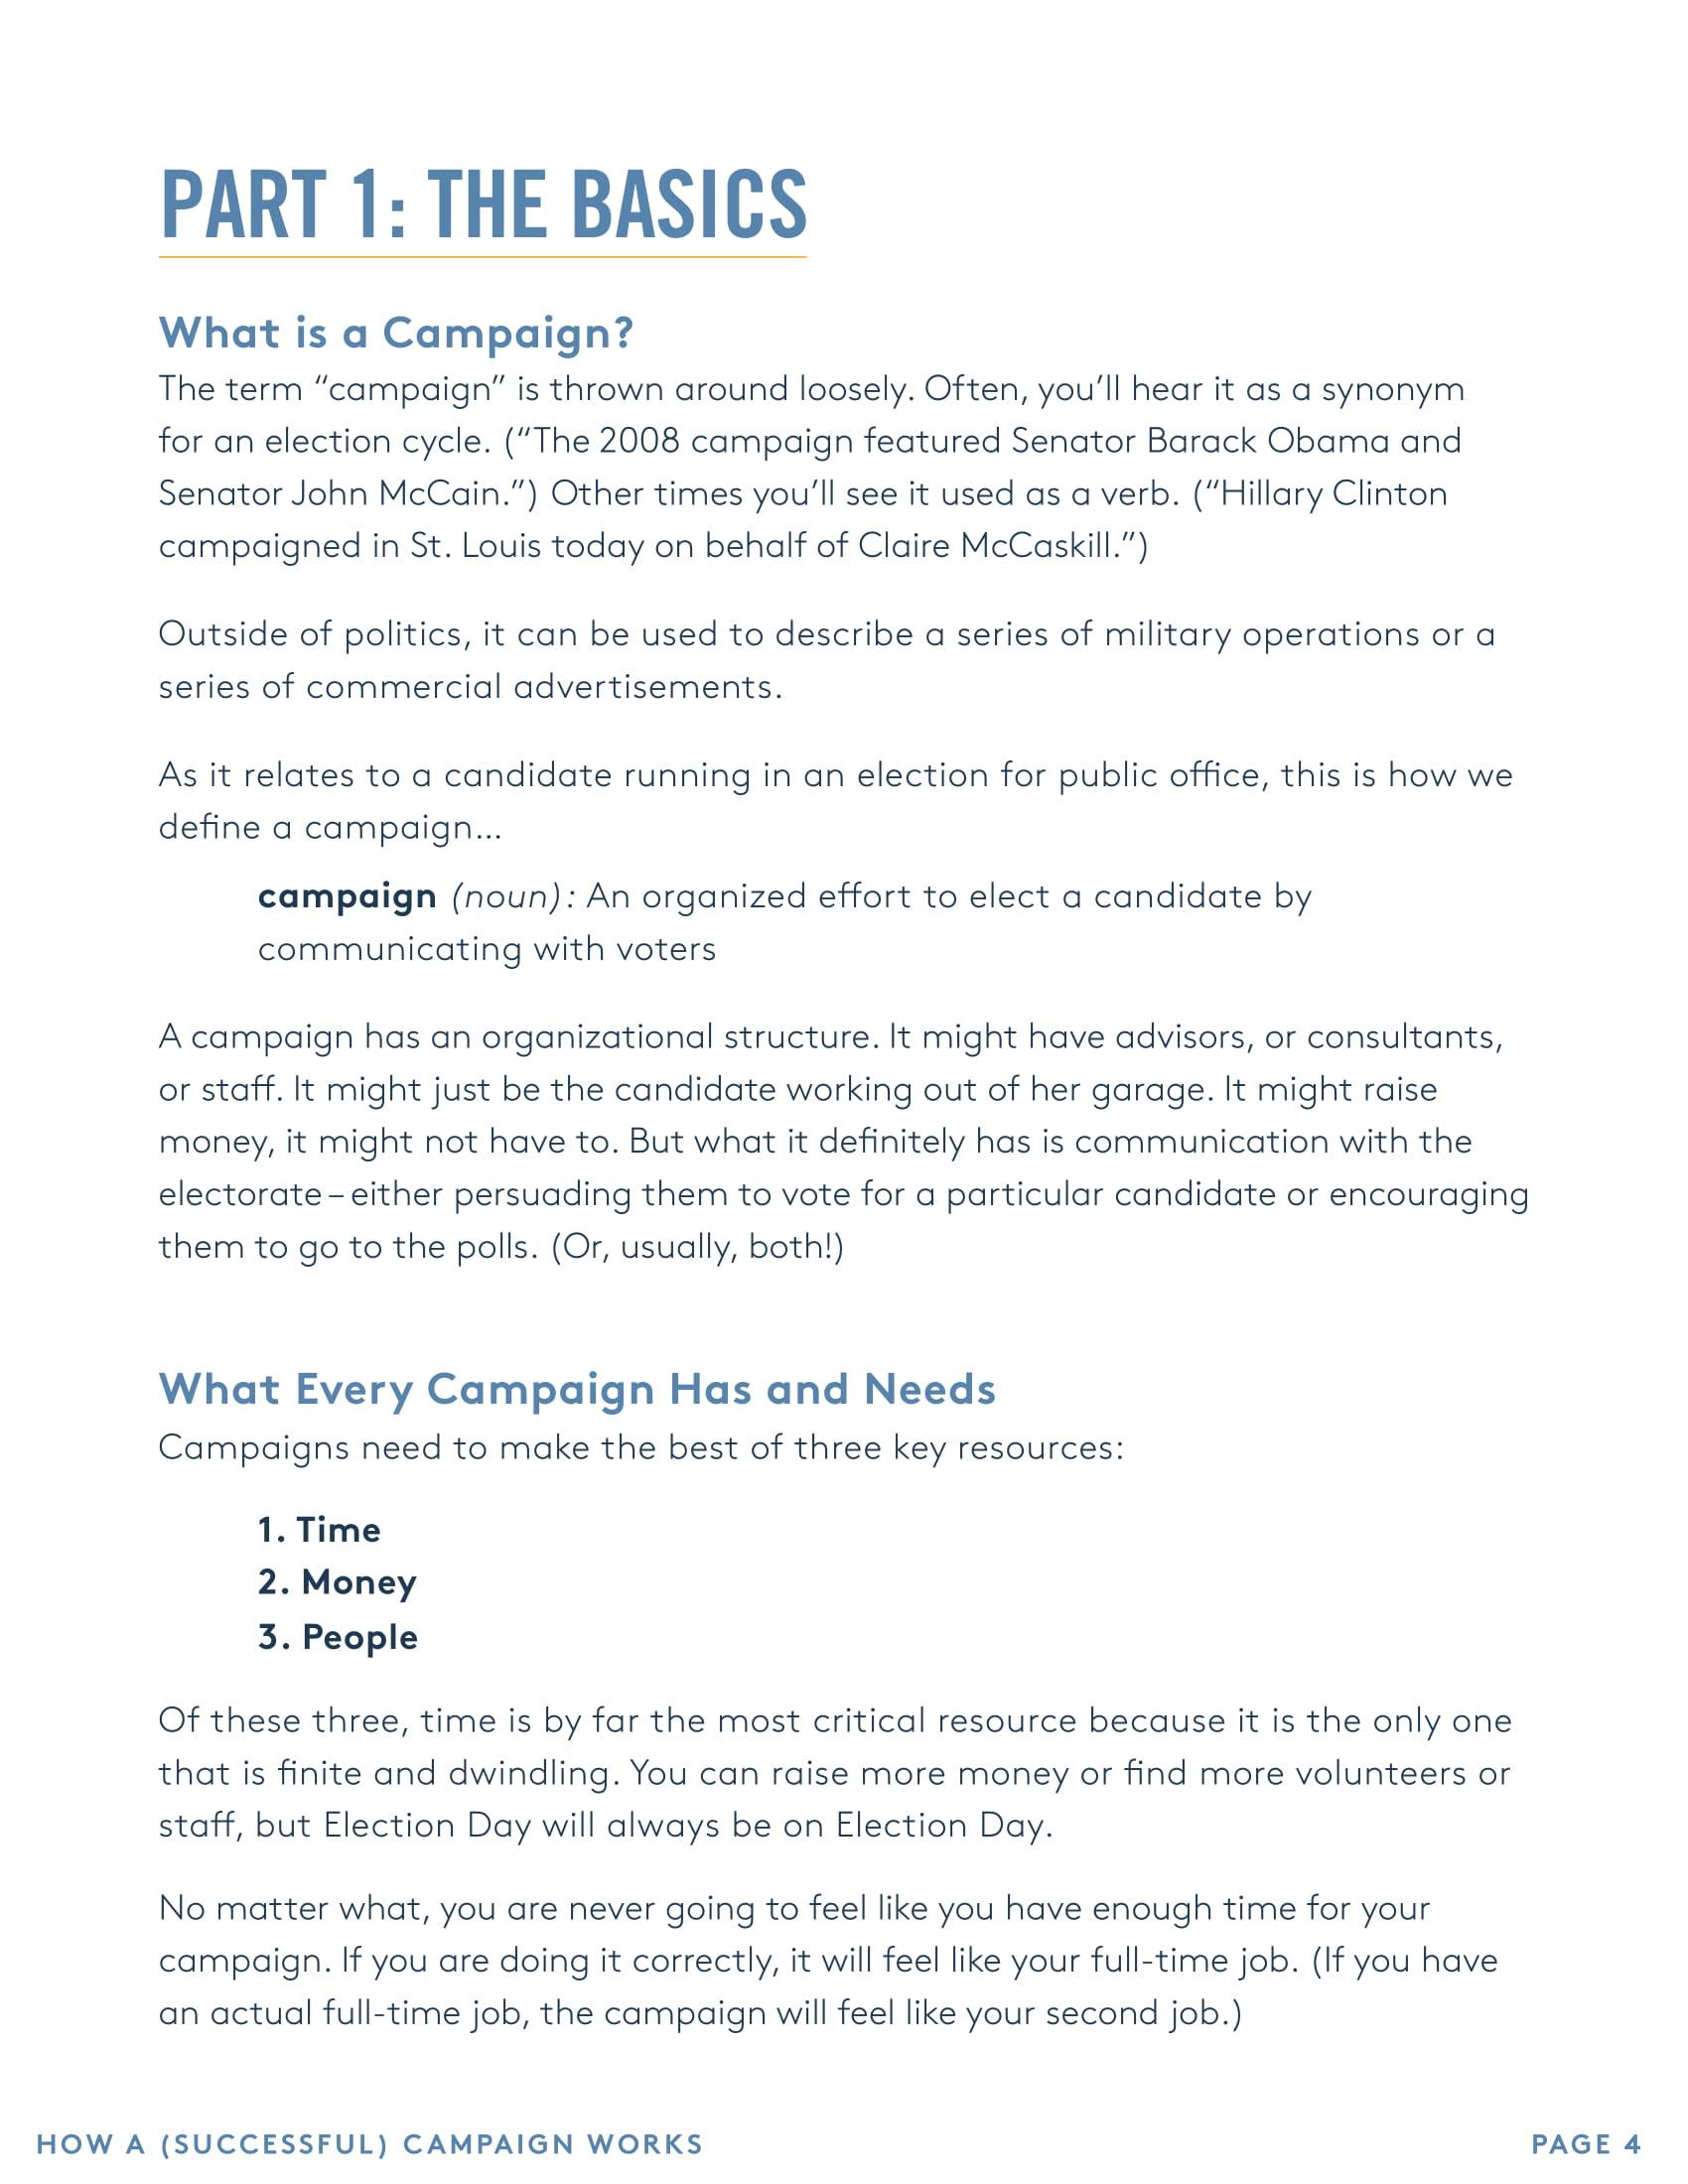 HSG_CampaignGuide_v5-04.jpg